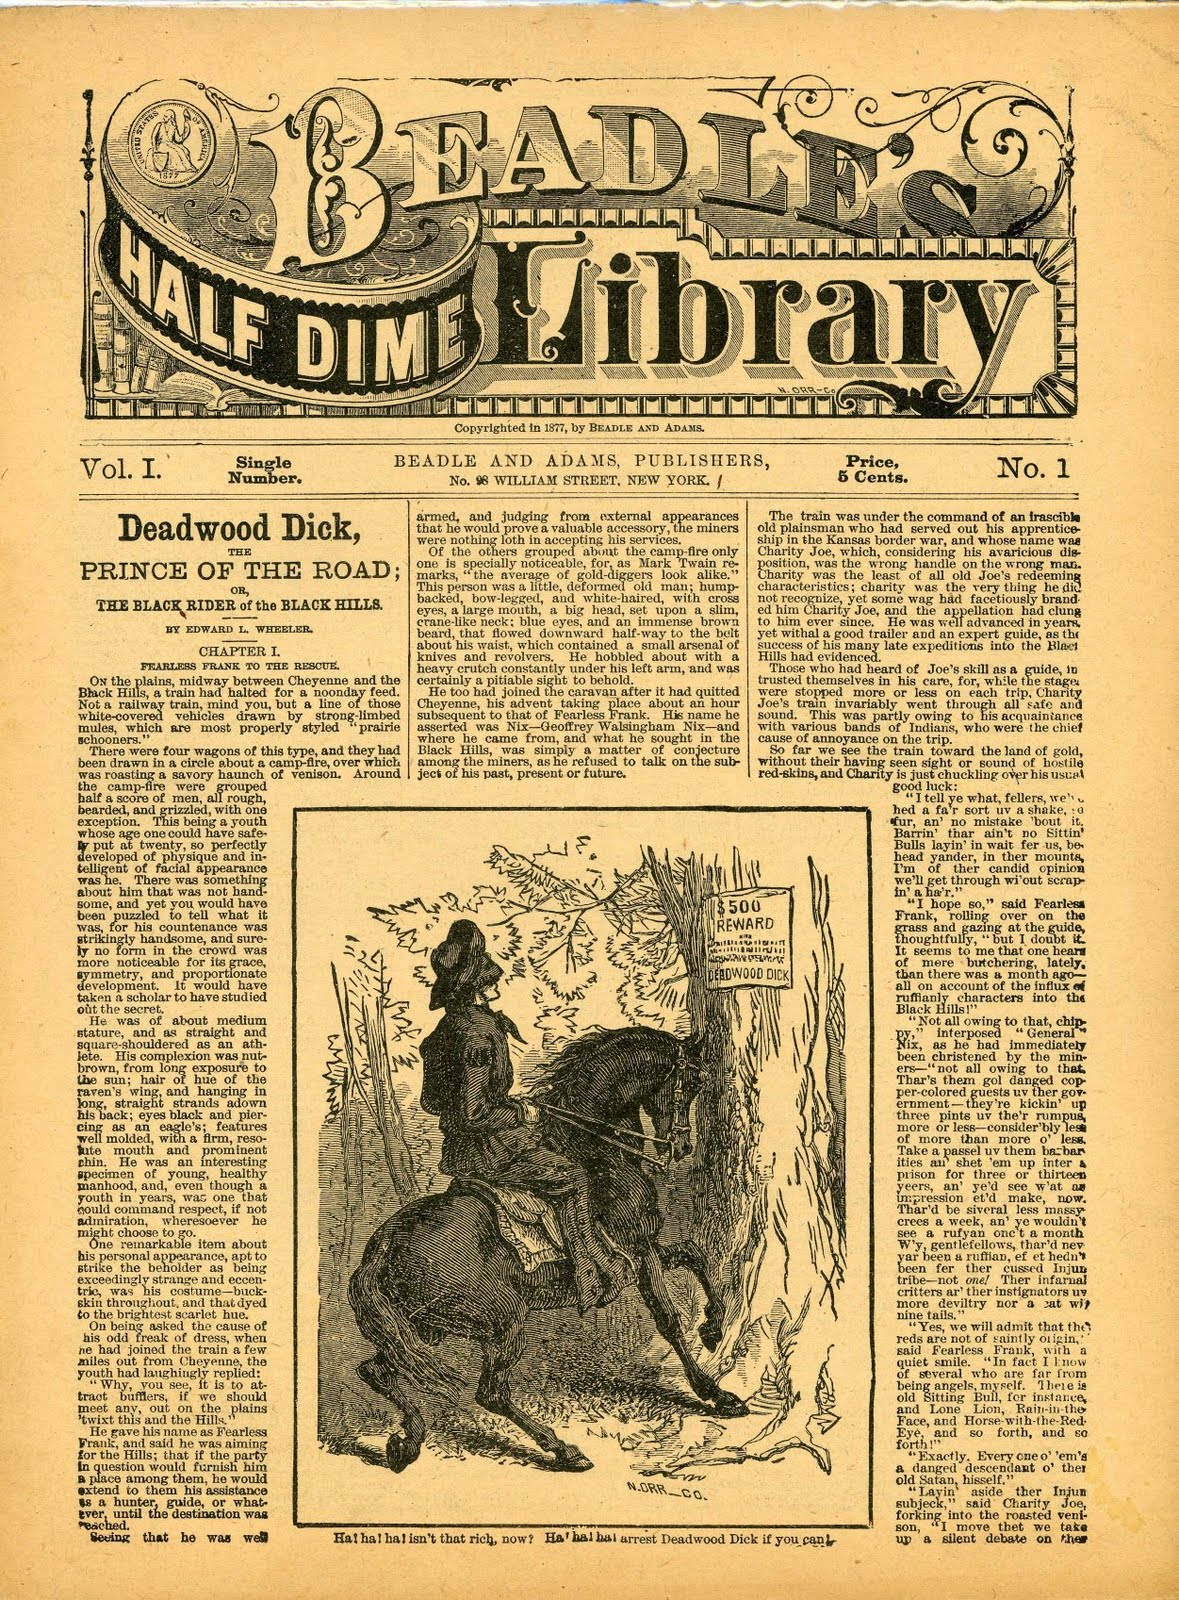 nineteenth century sensational fiction dime novels essay Free essay: nineteenth century sensational fiction: dime novels in the late nineteenth century, a new form of sensational fiction emerged called dime novels.